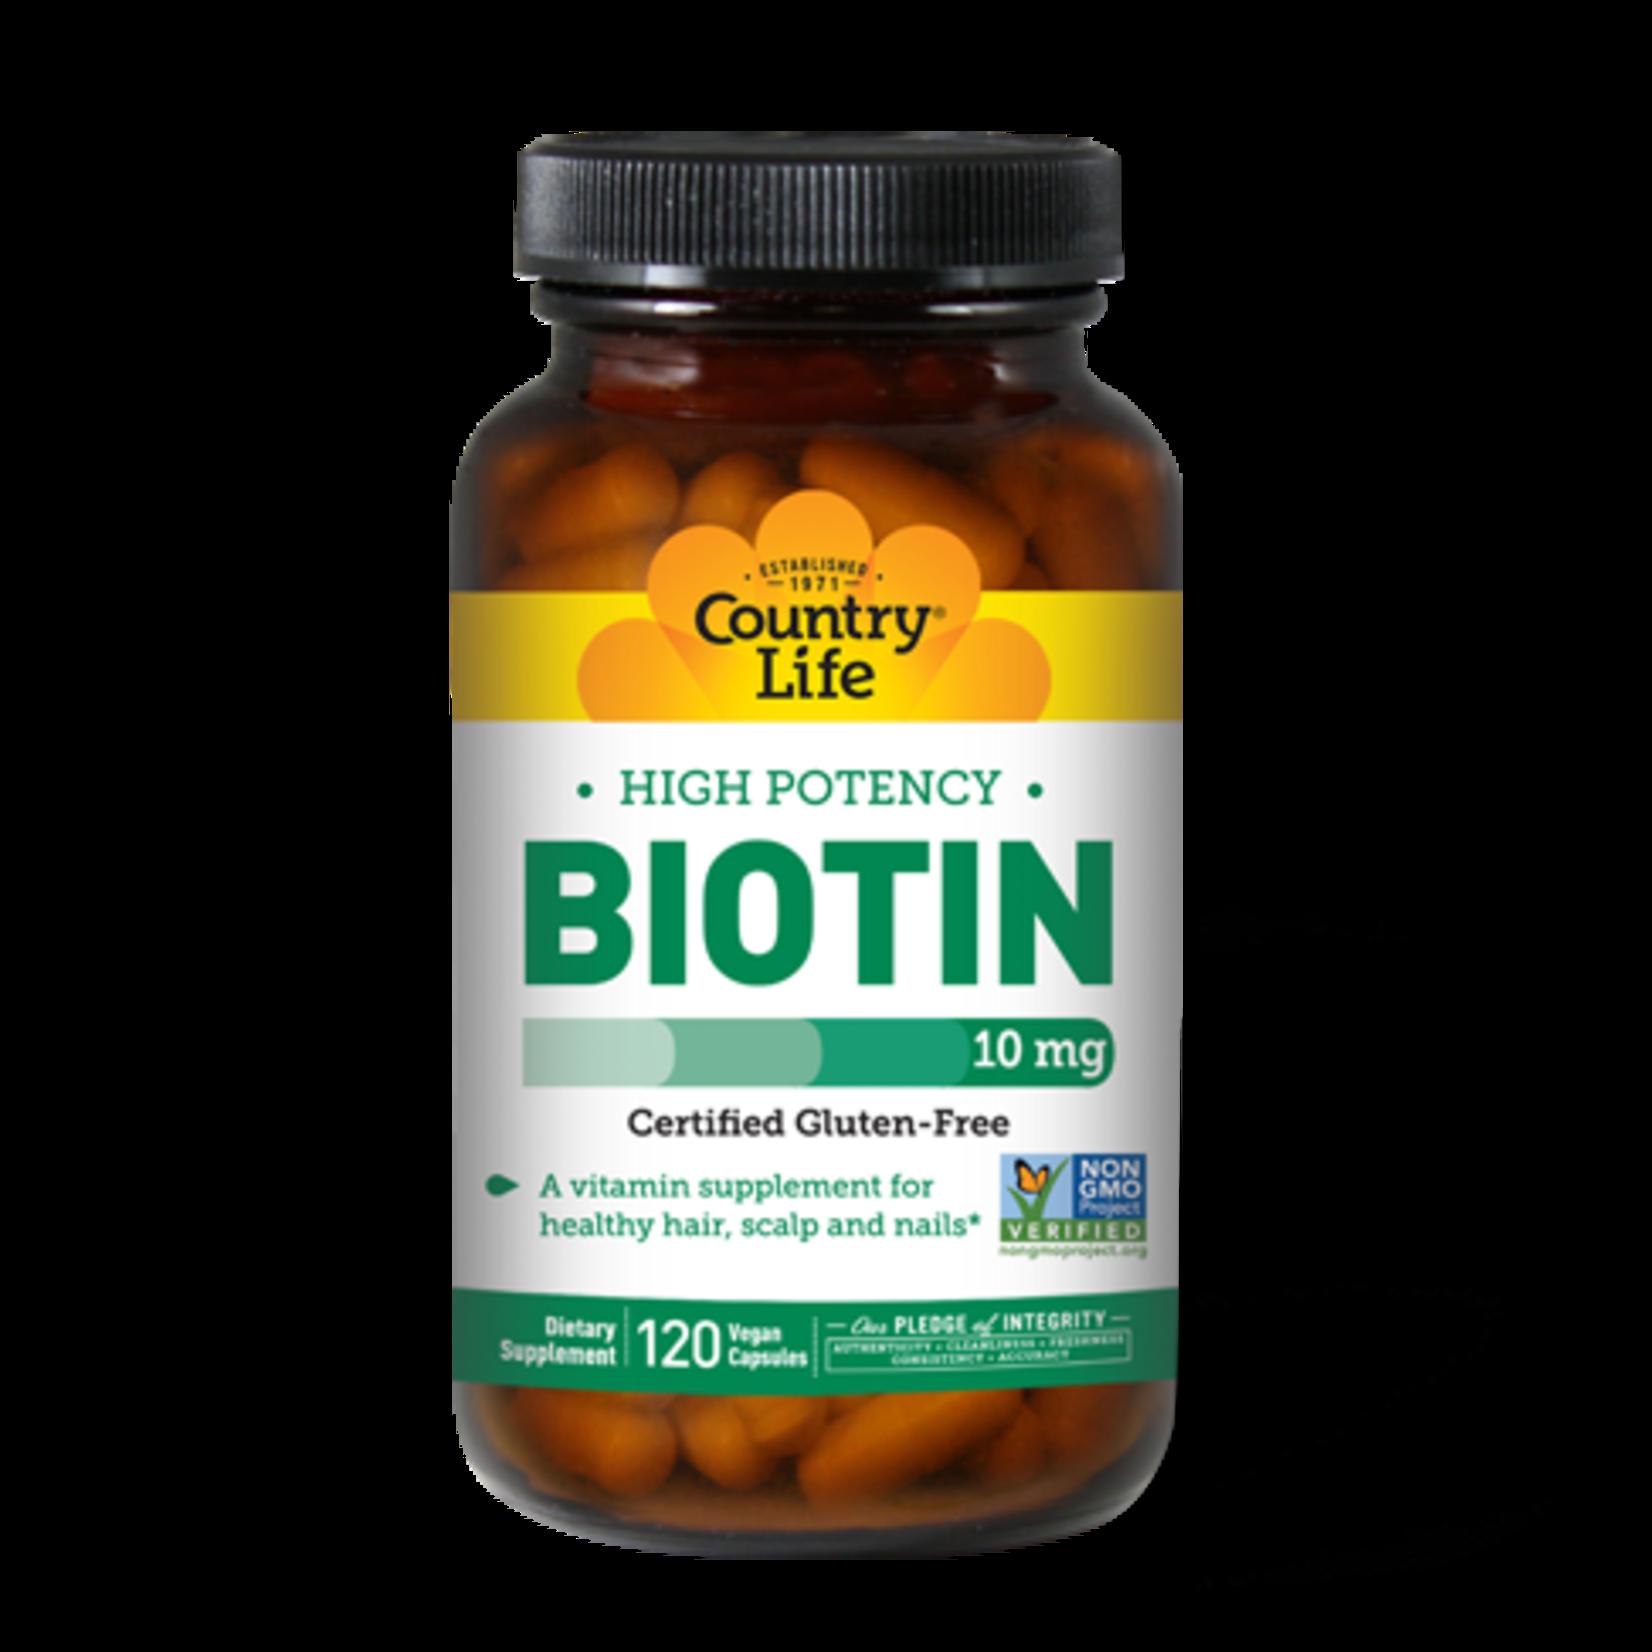 Country Life Country Life High Potency Biotin 10mg